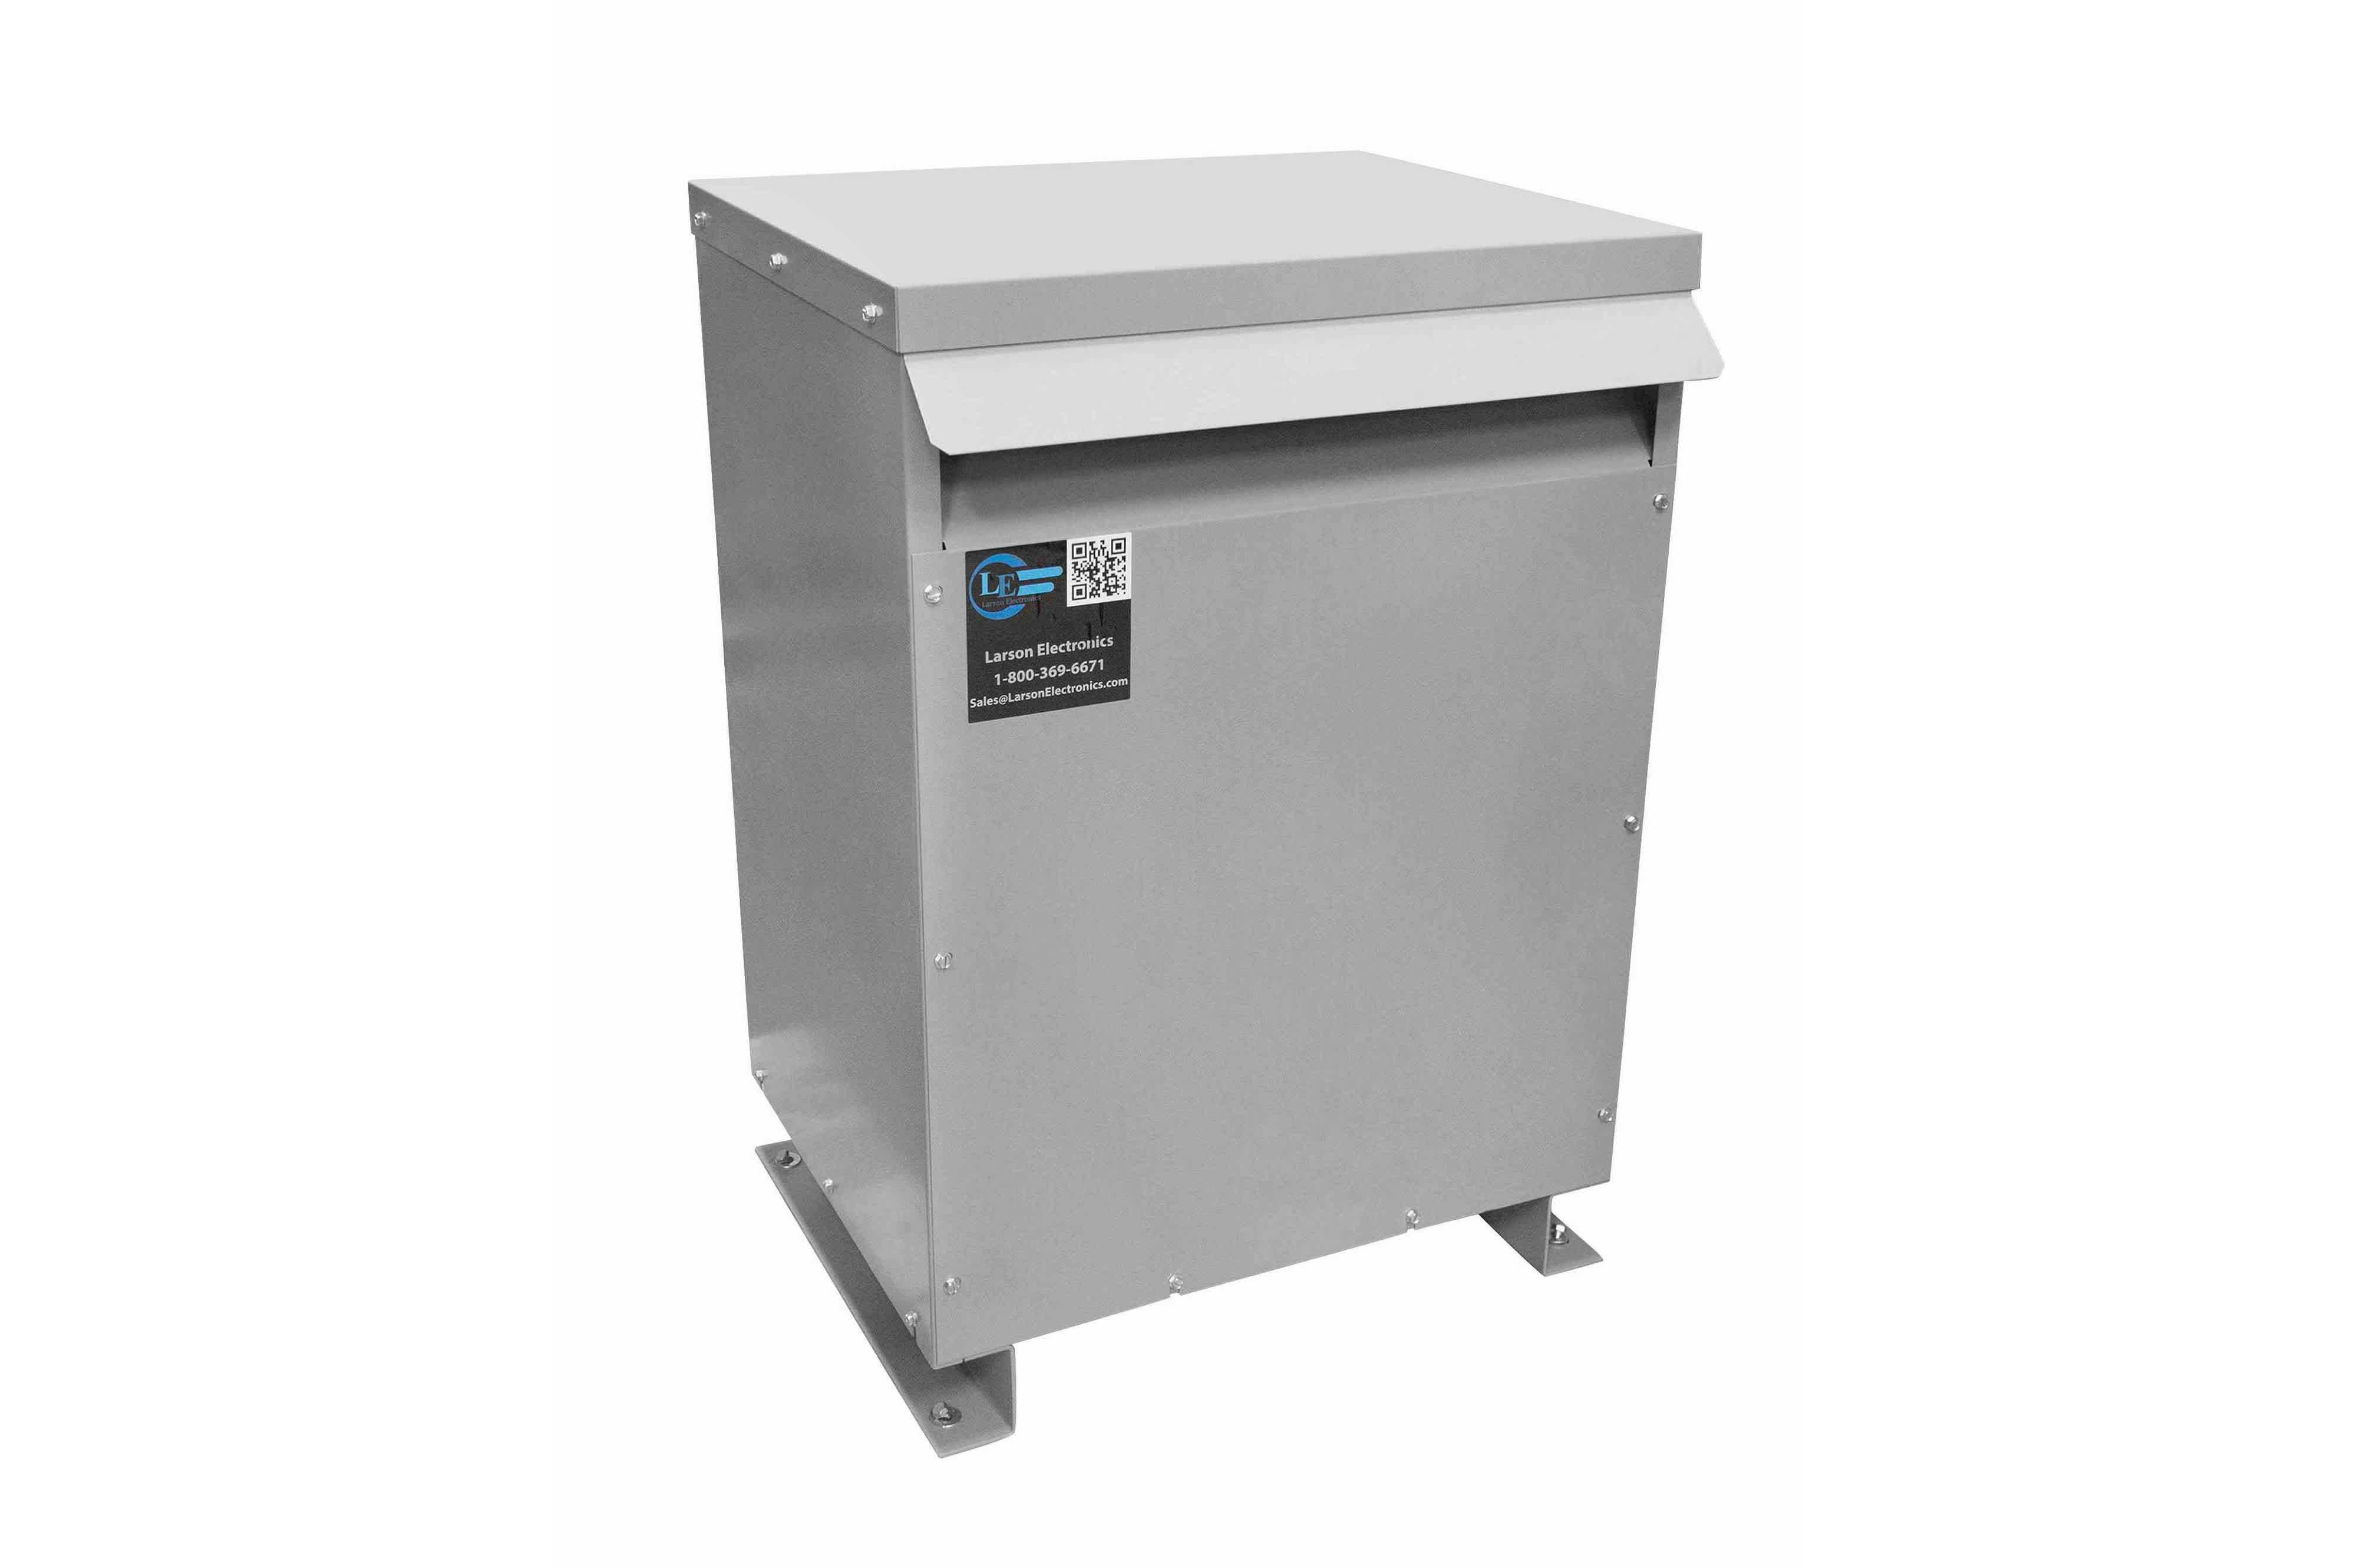 65 kVA 3PH Isolation Transformer, 240V Wye Primary, 380Y/220 Wye-N Secondary, N3R, Ventilated, 60 Hz